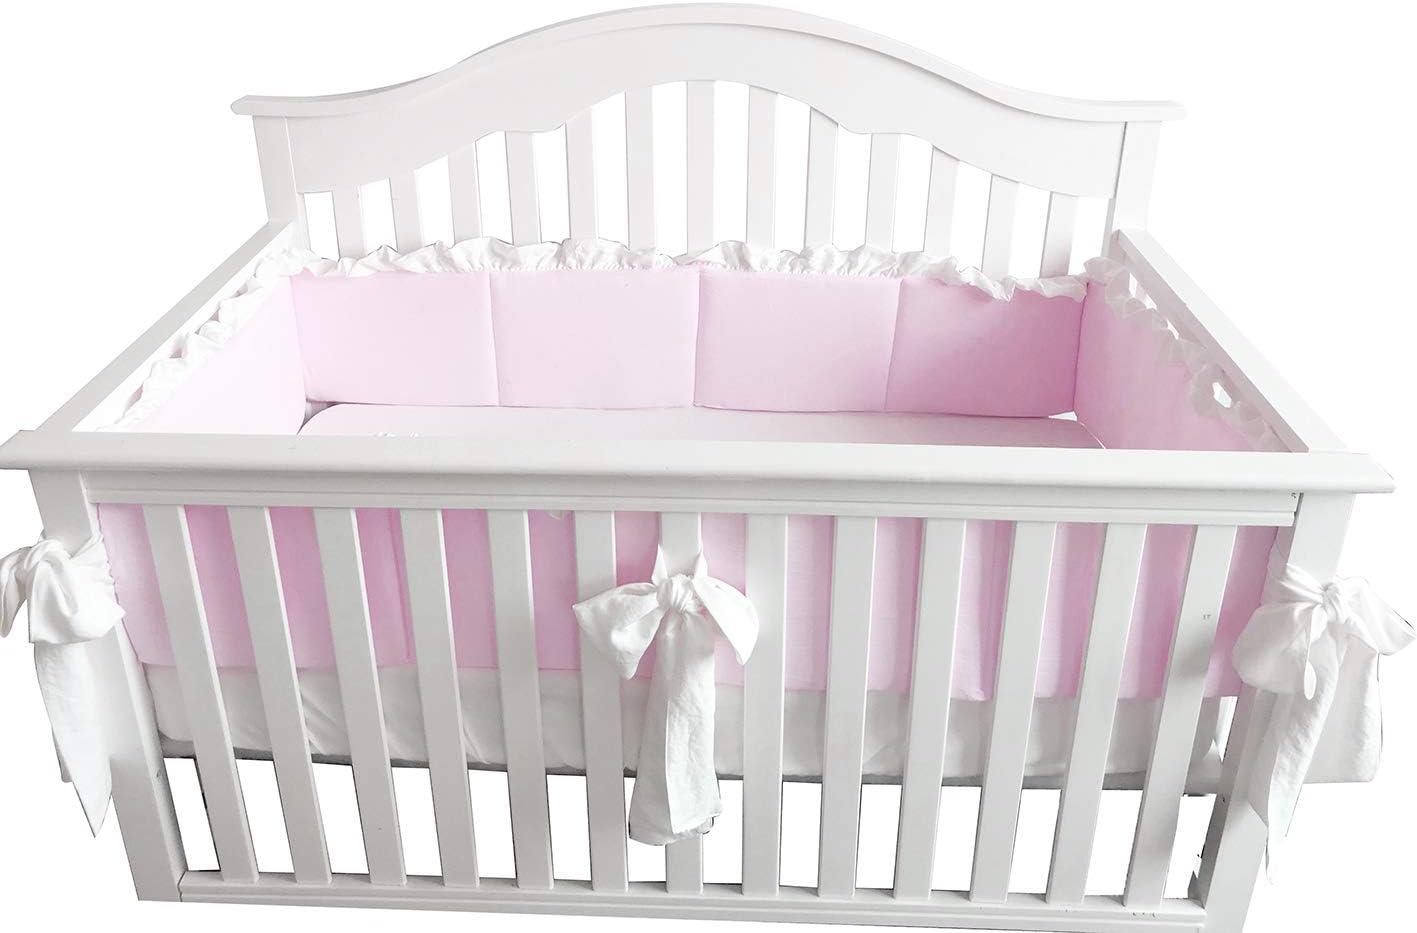 Blush Coral Pink Ruffle Crib Bedding Set Baby Girl Bedding Blanket Nursery Crib Skirt Set Baby Girl Crib Bedding Sheet (Pear Pink, Bumper with Big Bows)